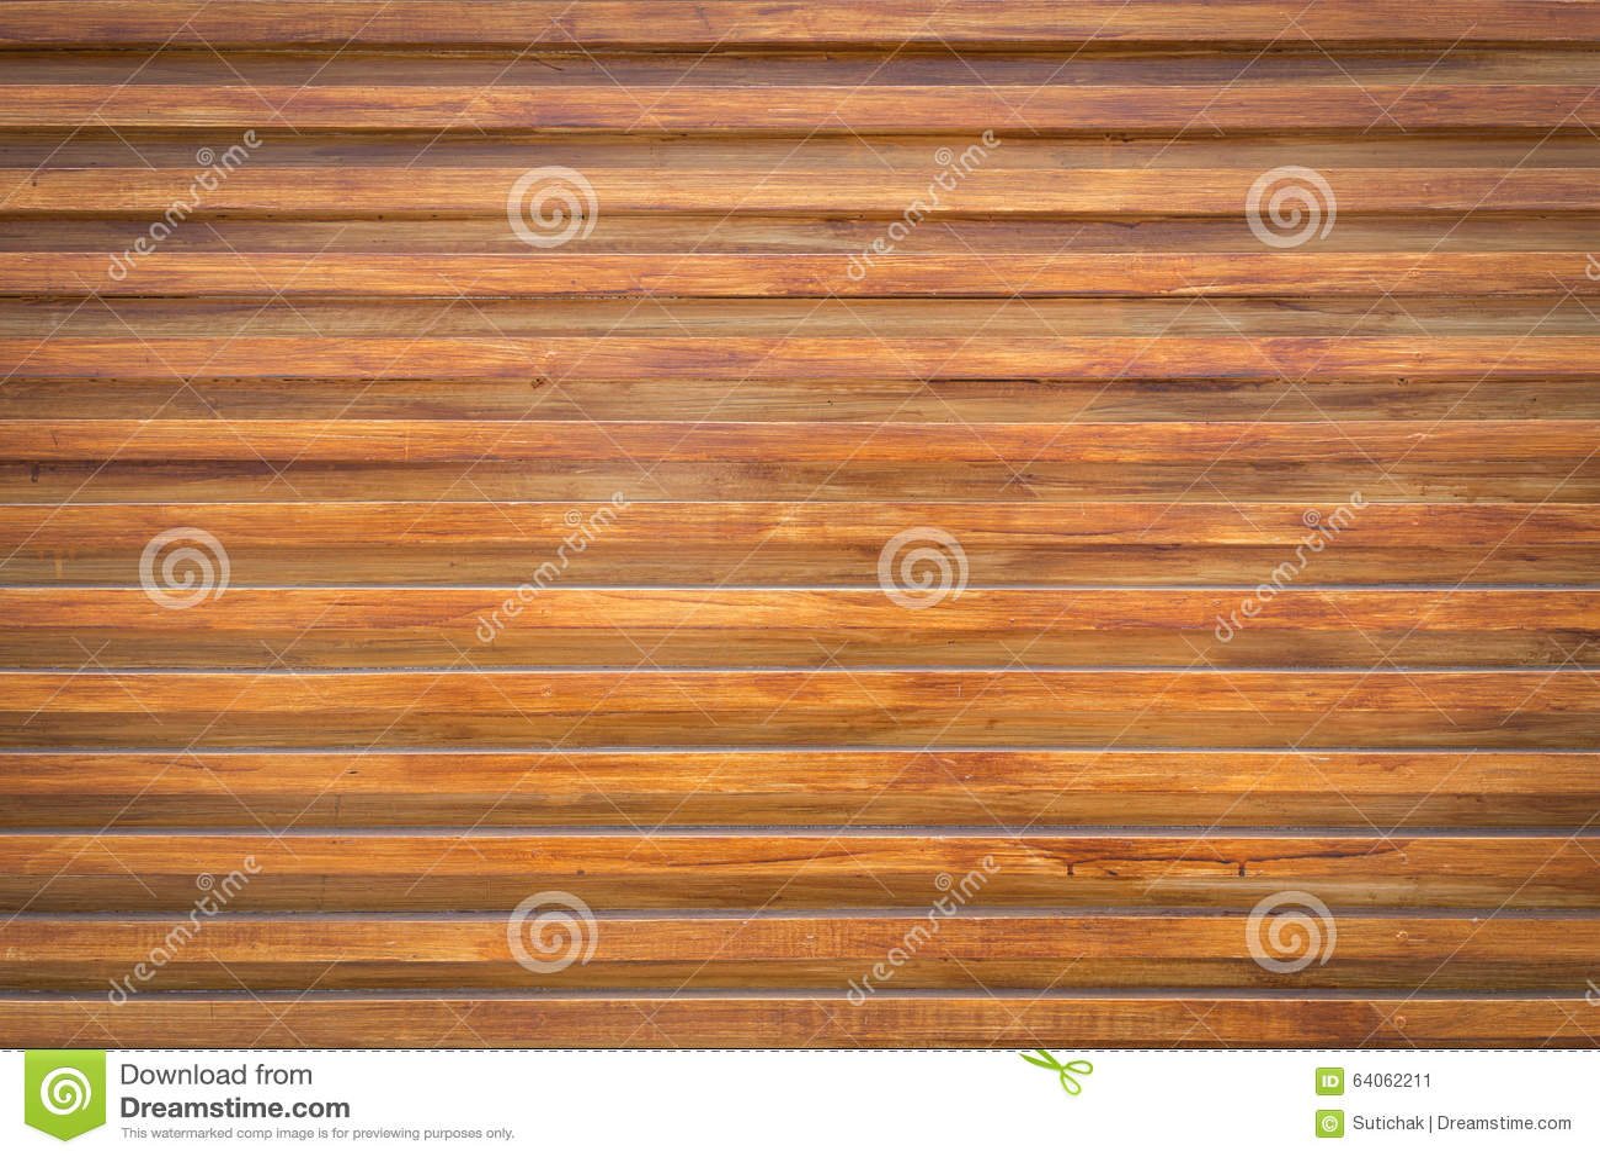 design of wood wall texture background wooden stick. Black Bedroom Furniture Sets. Home Design Ideas